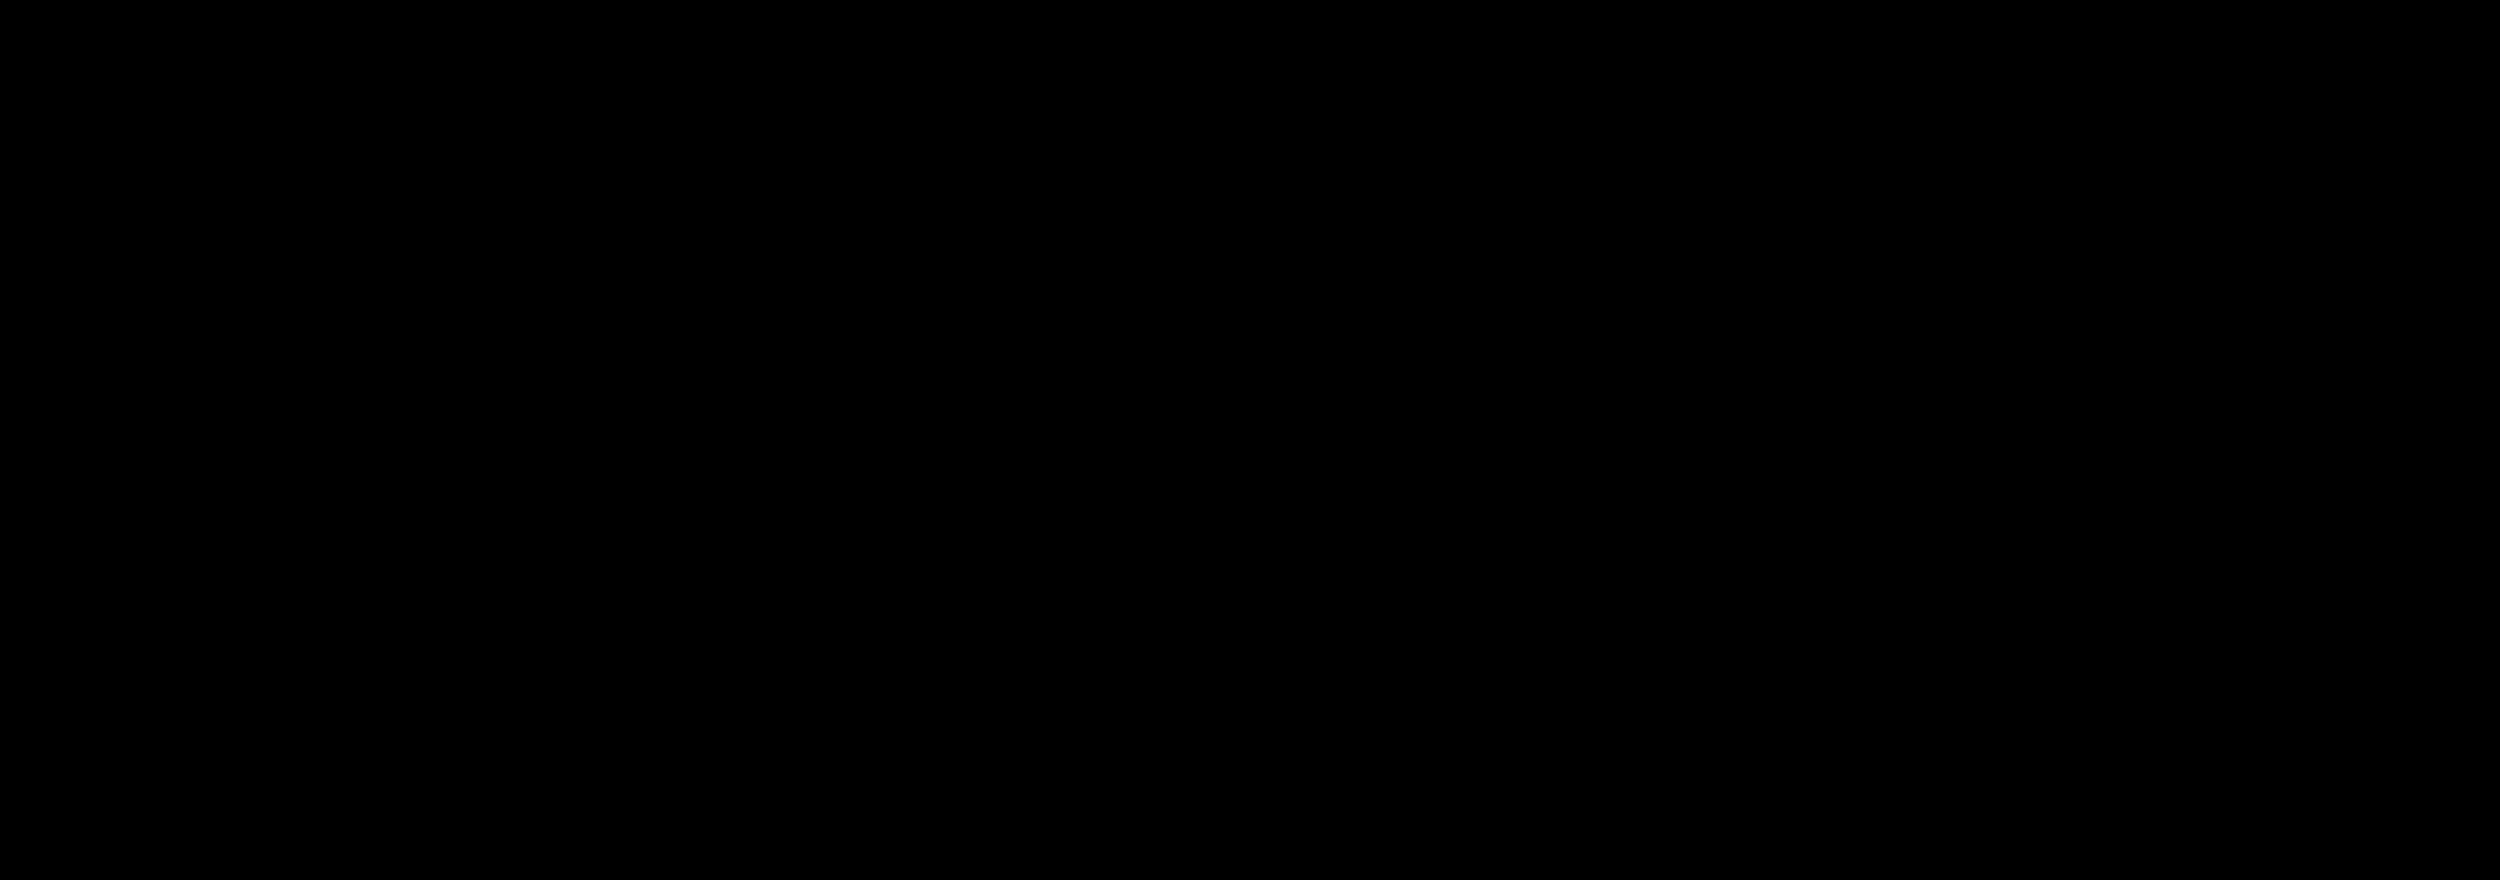 truemyth-brand-marks-large-black-print.png